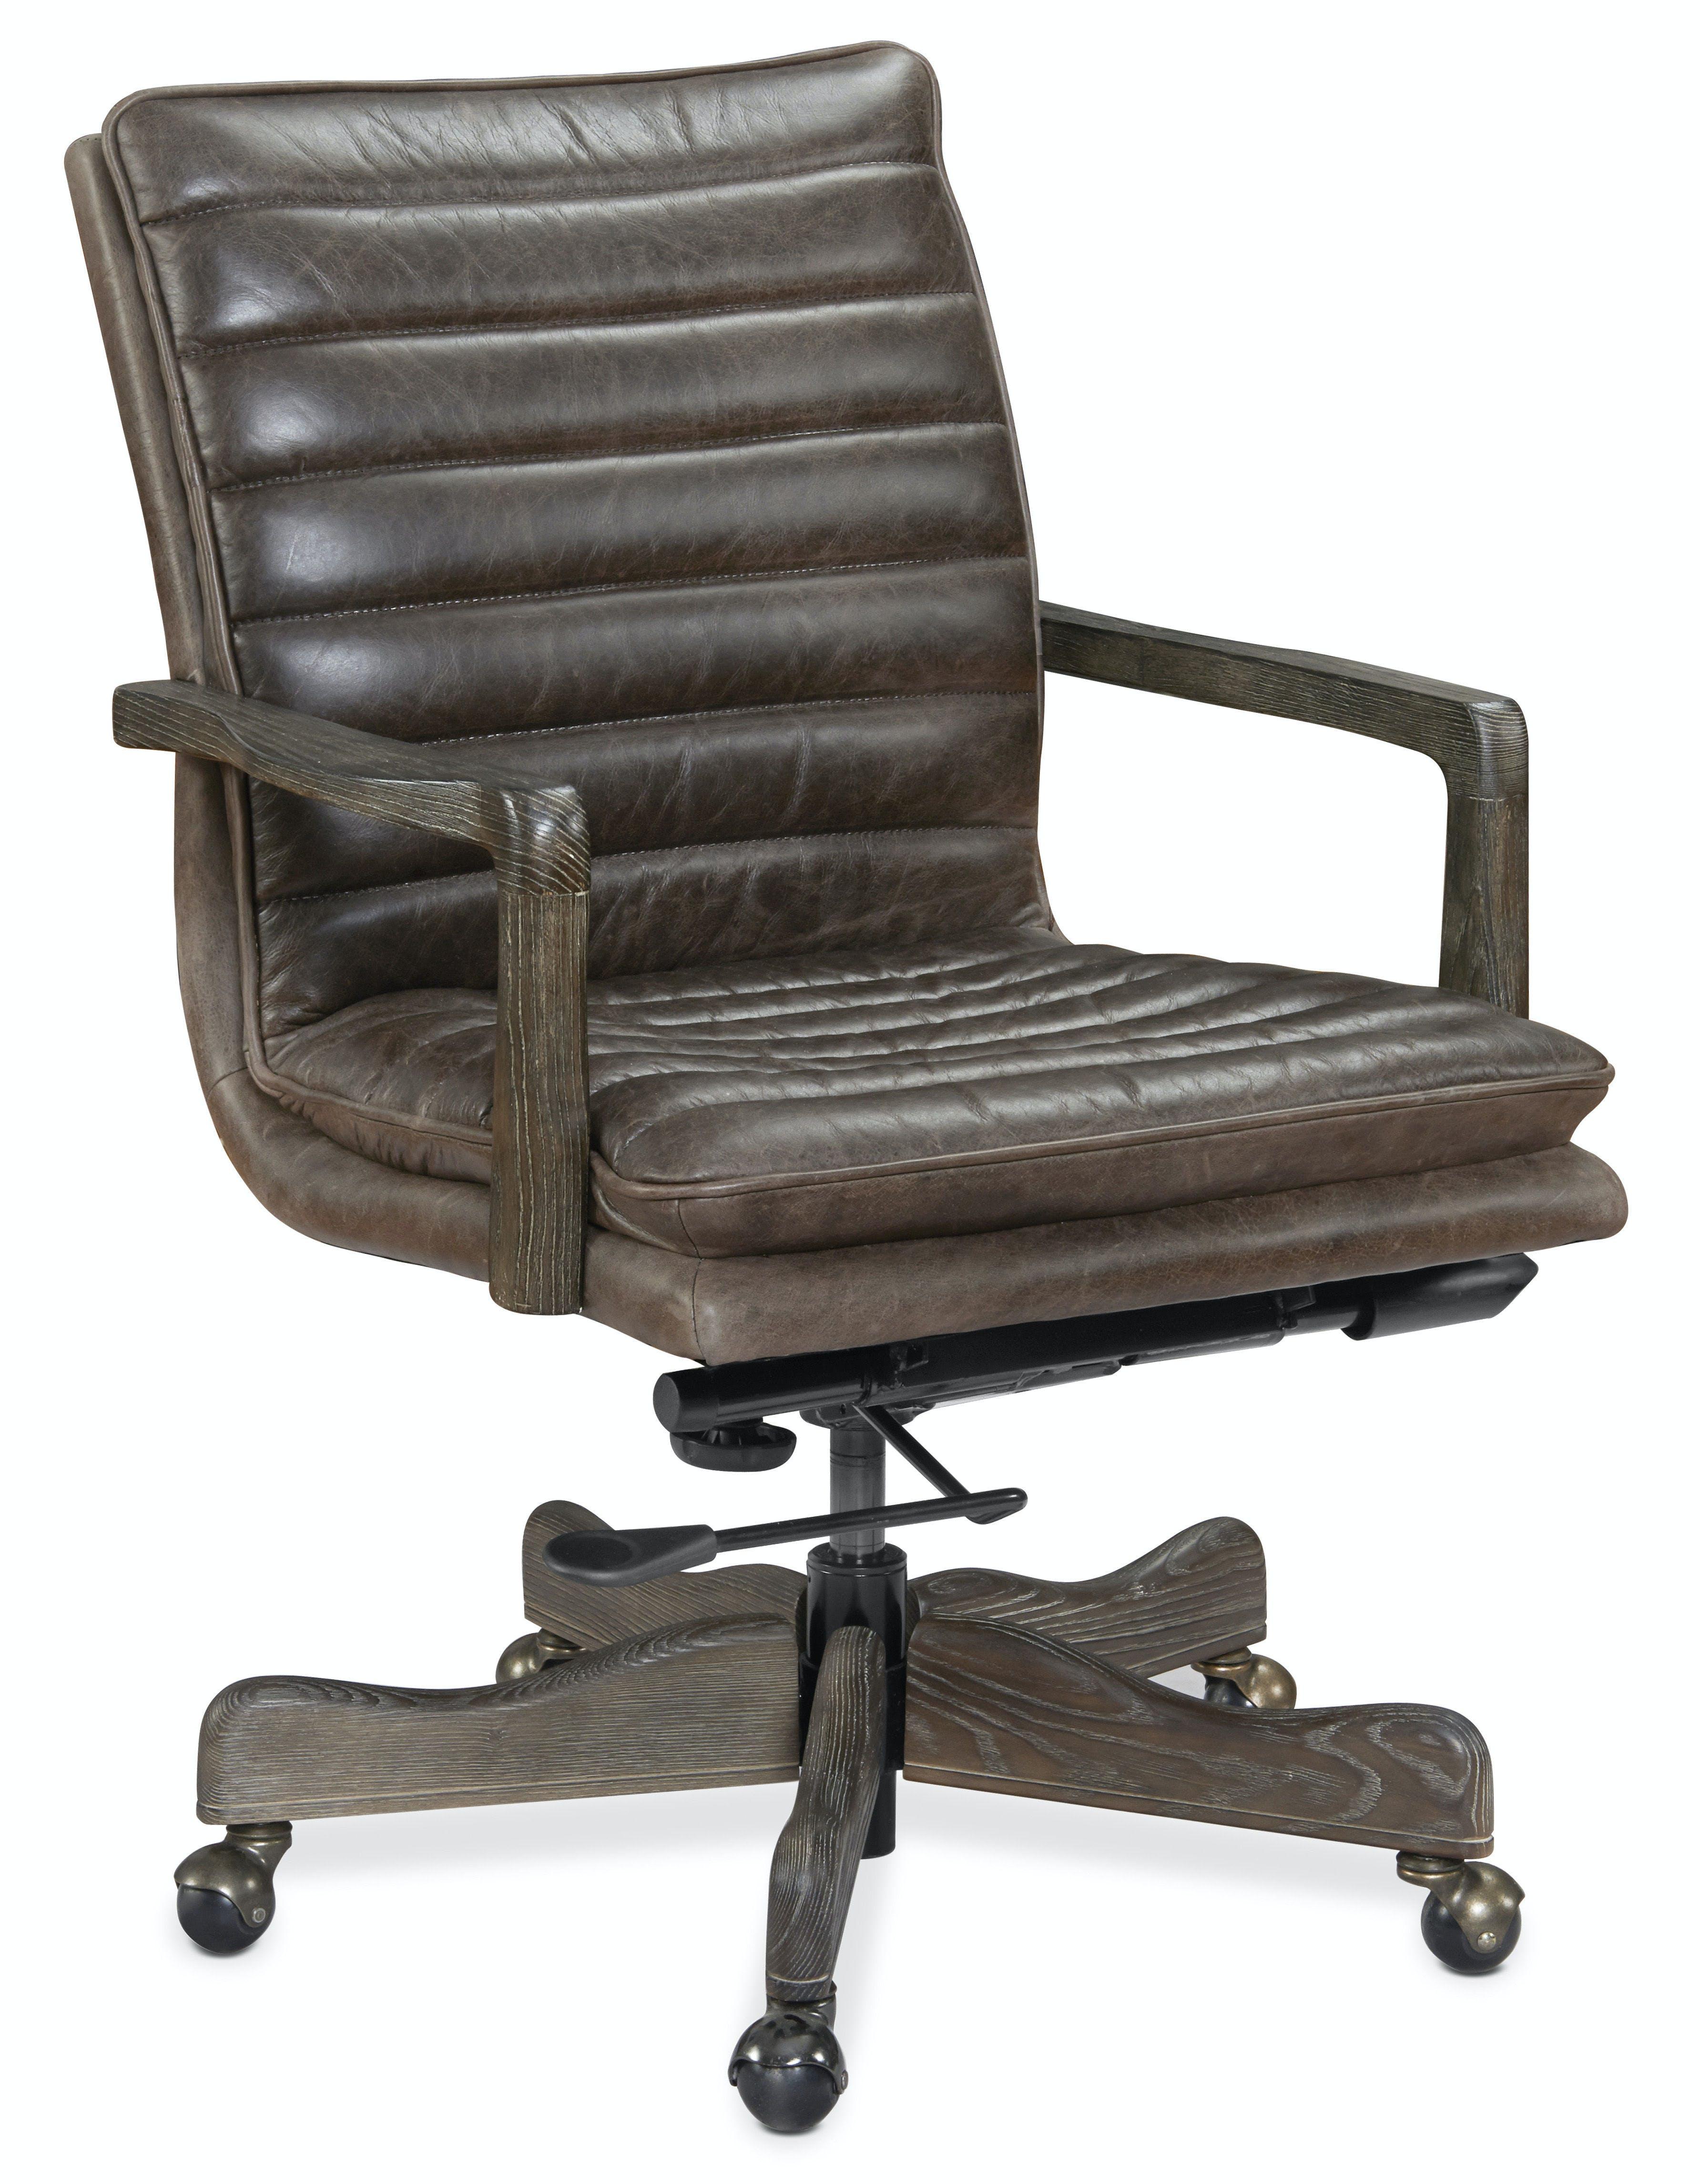 Hooker Furniture Home Office Langston Executive Swivel Tilt